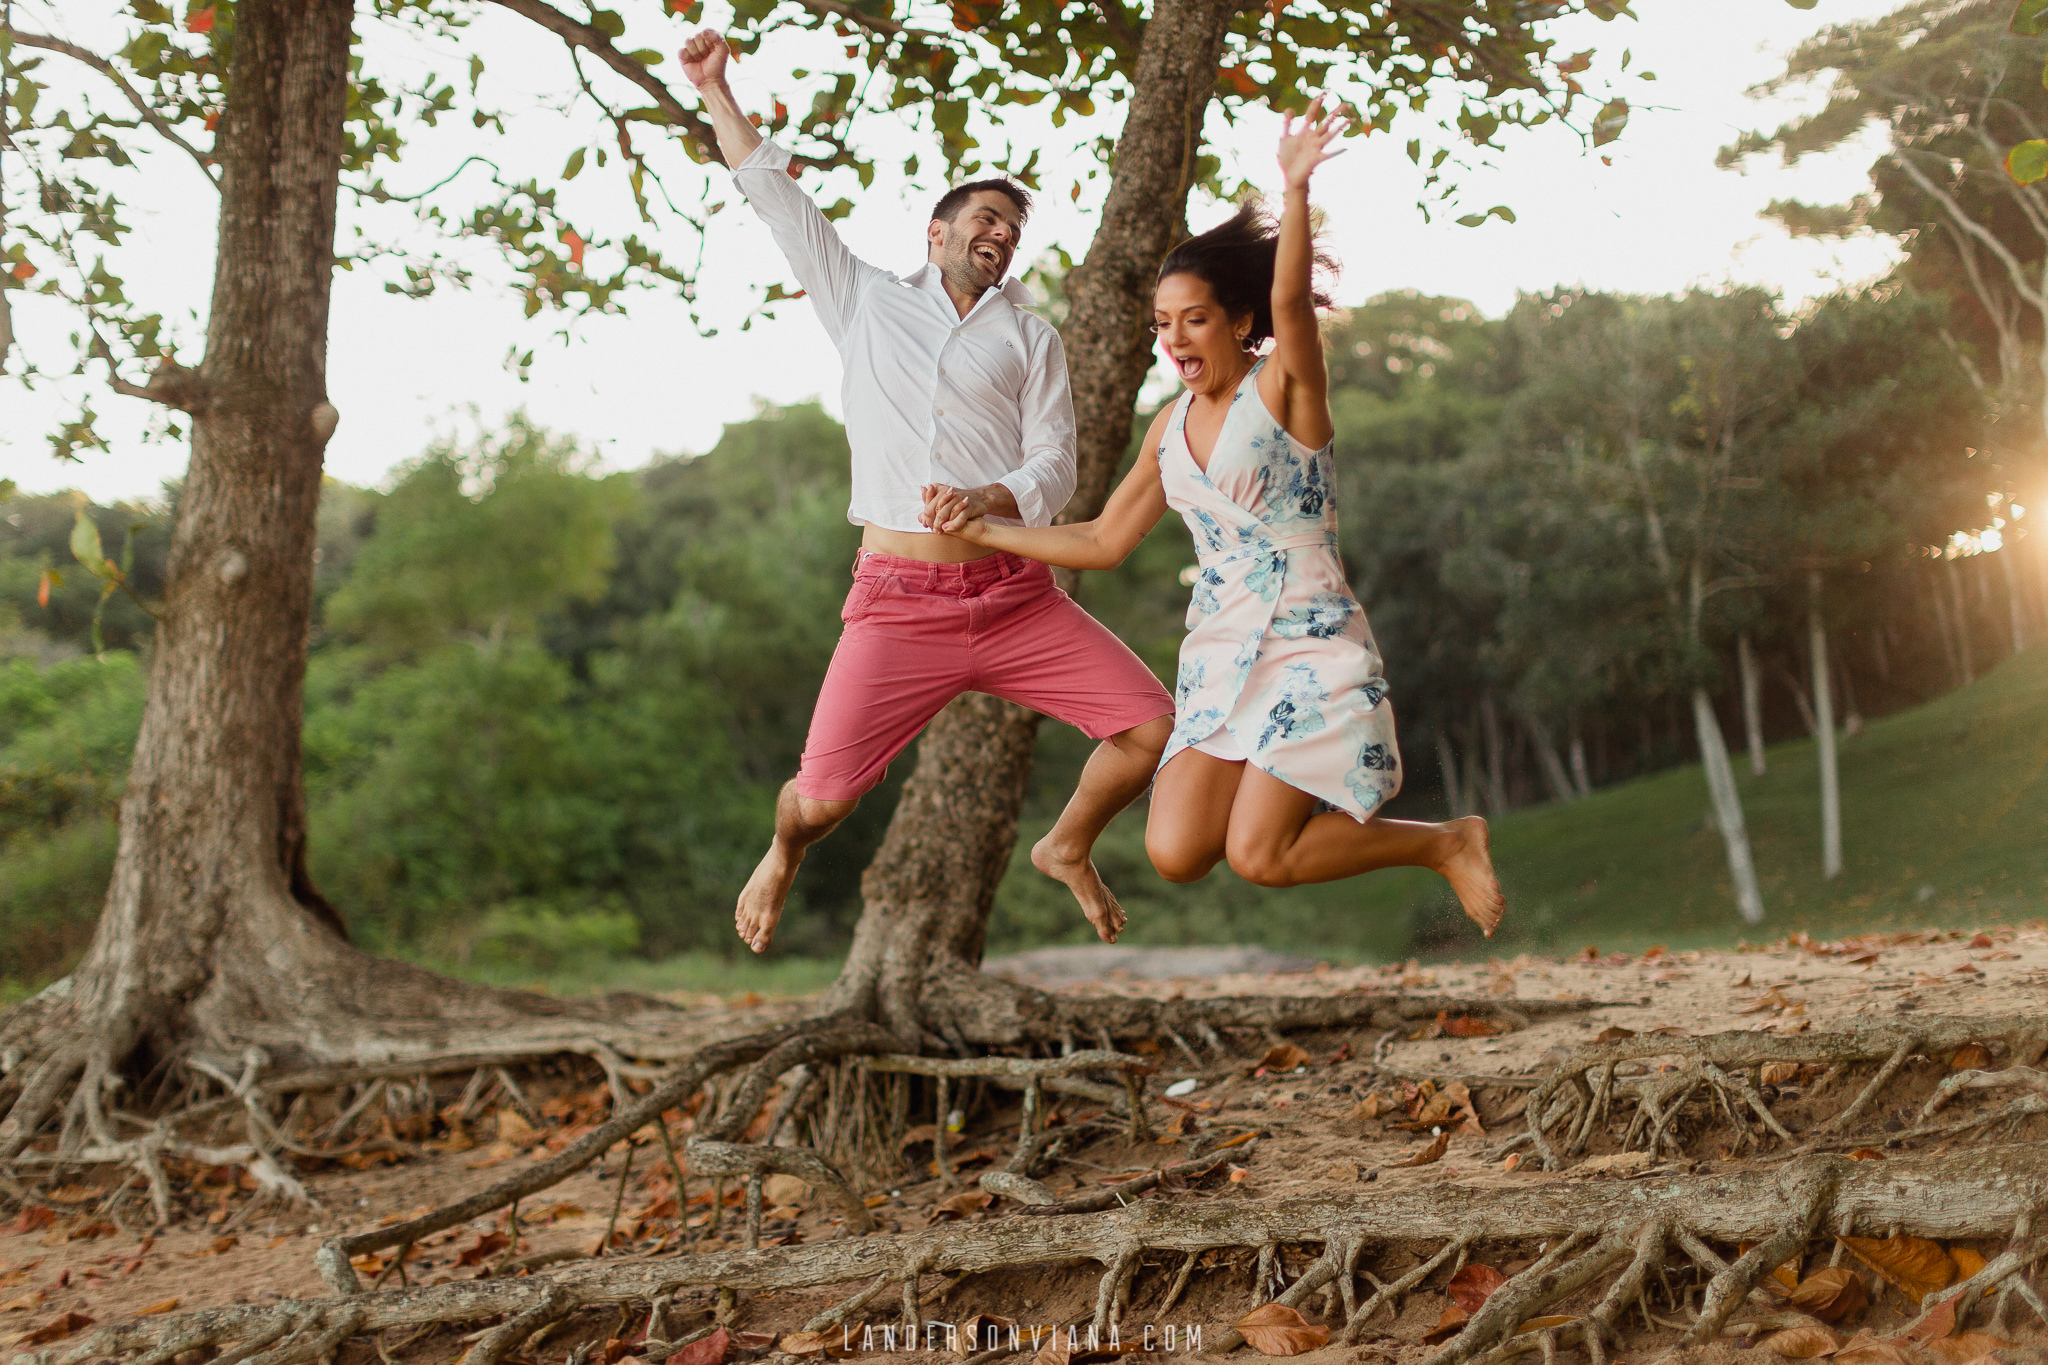 ensaio-pre-wedding-praia-landerson-viana-fotografia-casamento-pegueiobouquet-12.jpg